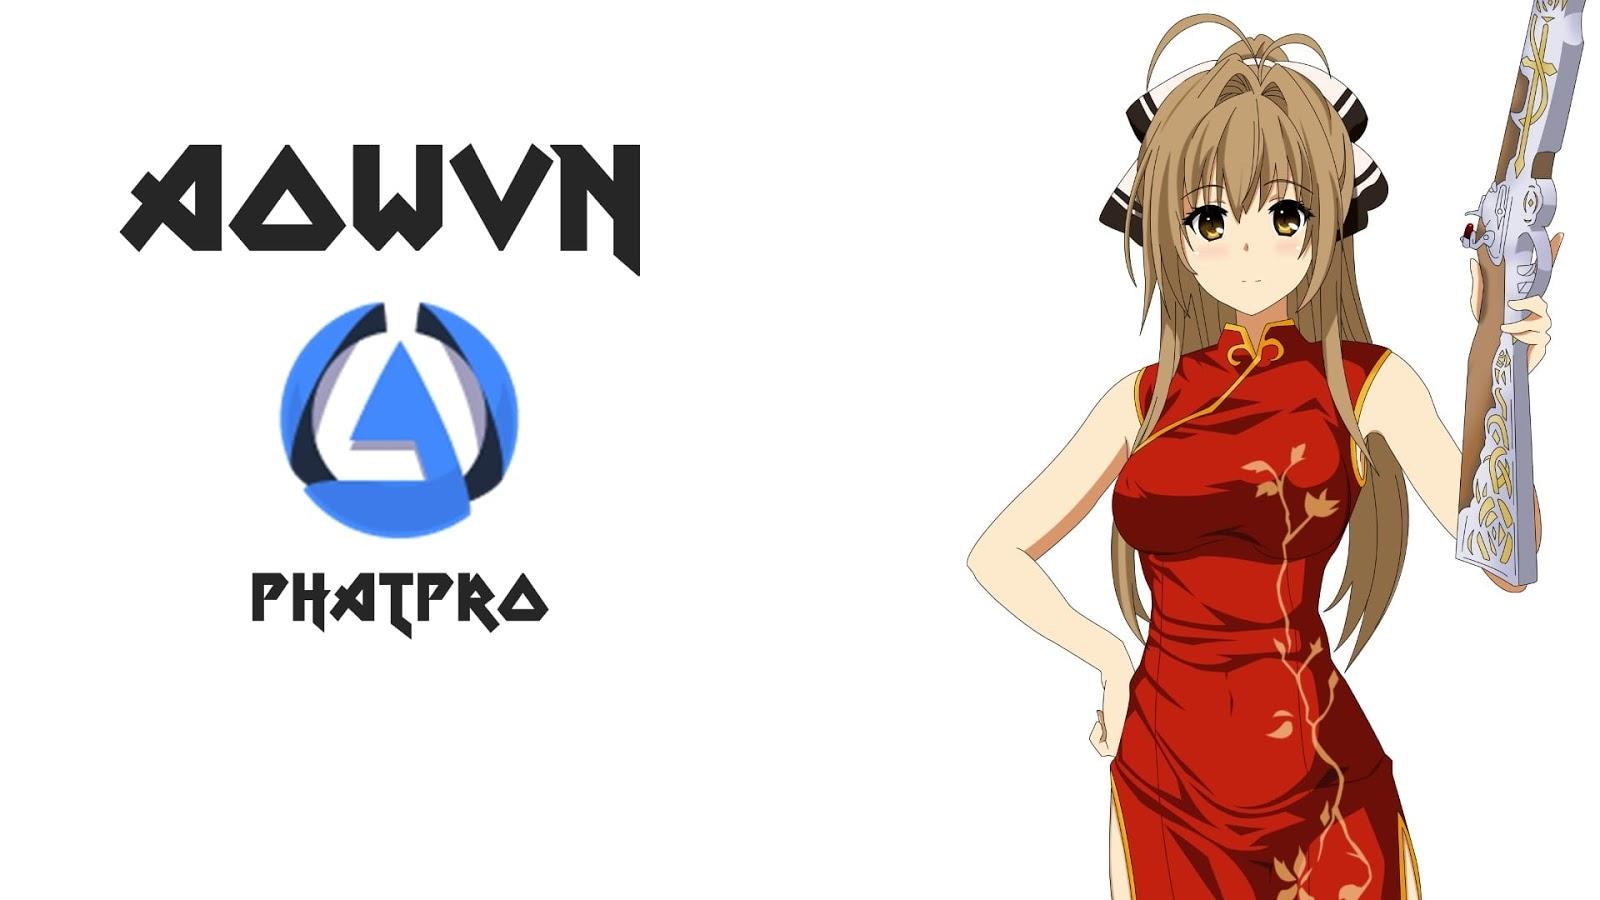 Amagi%2B %2BPhatpro%2B%25282%2529 min - [ Anime 3gp Mp4 ] Amagi Brilliant Park BD + Ova + SP | Vietsub - Cực Hài - Cực Moe